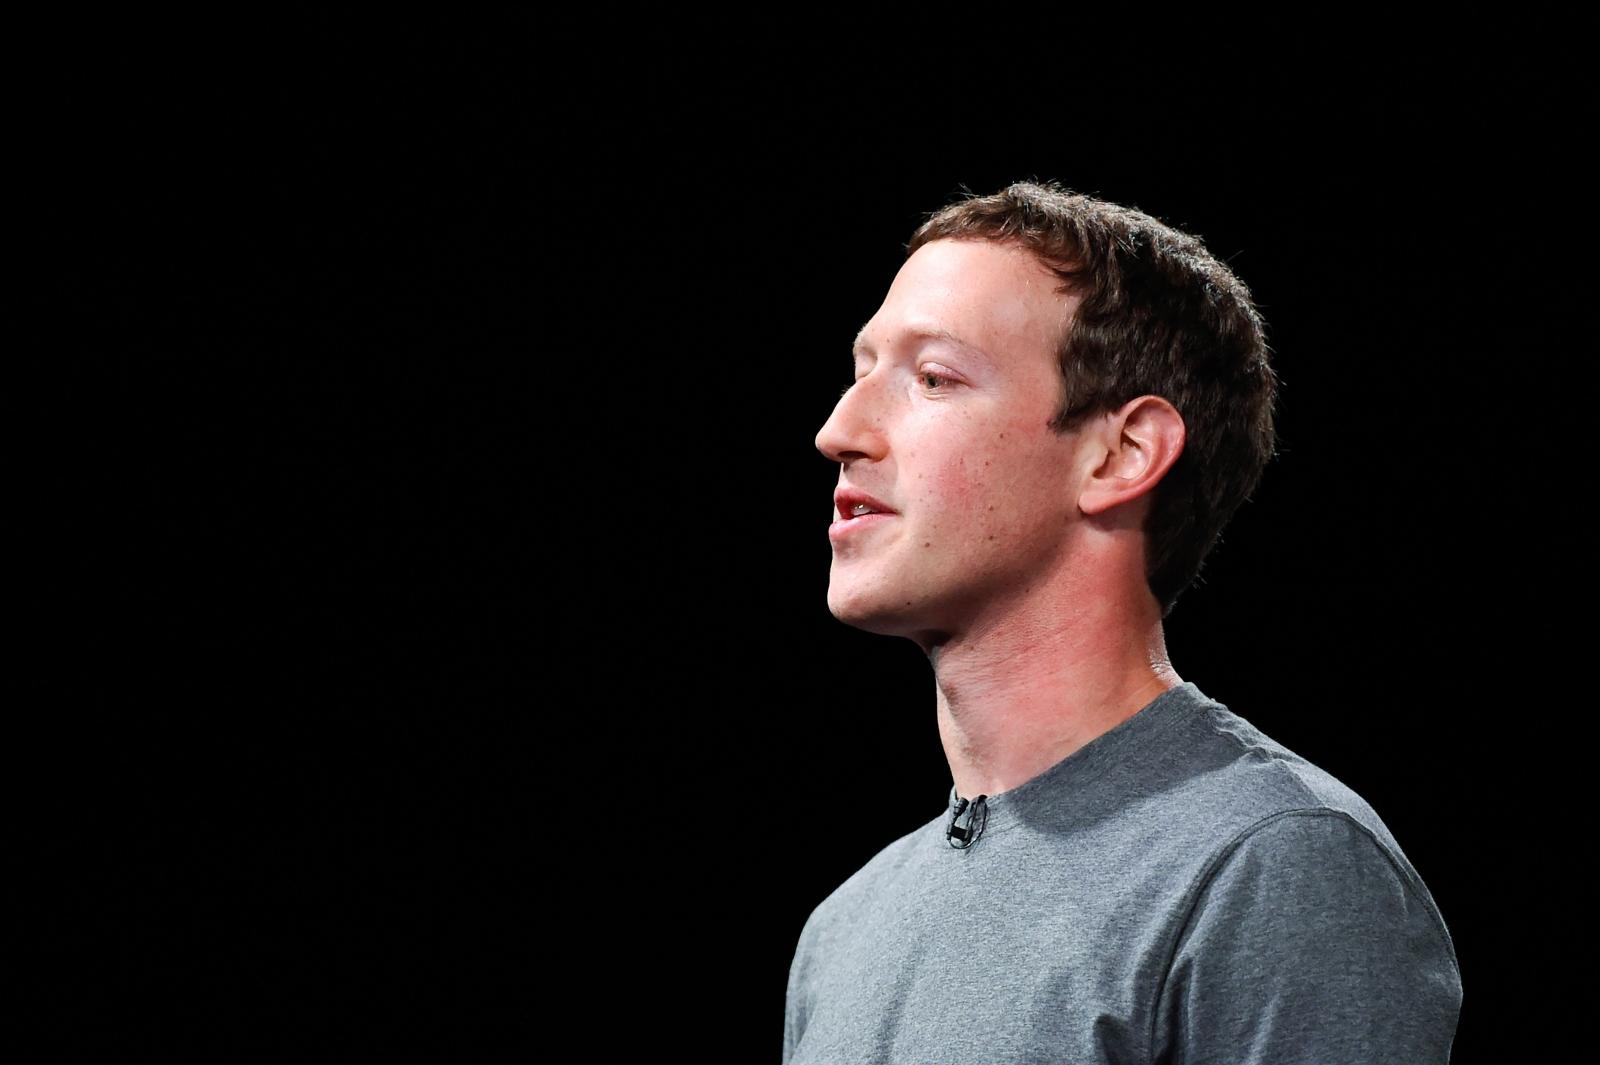 Founder CEO Facebook Mark Zuckerberg